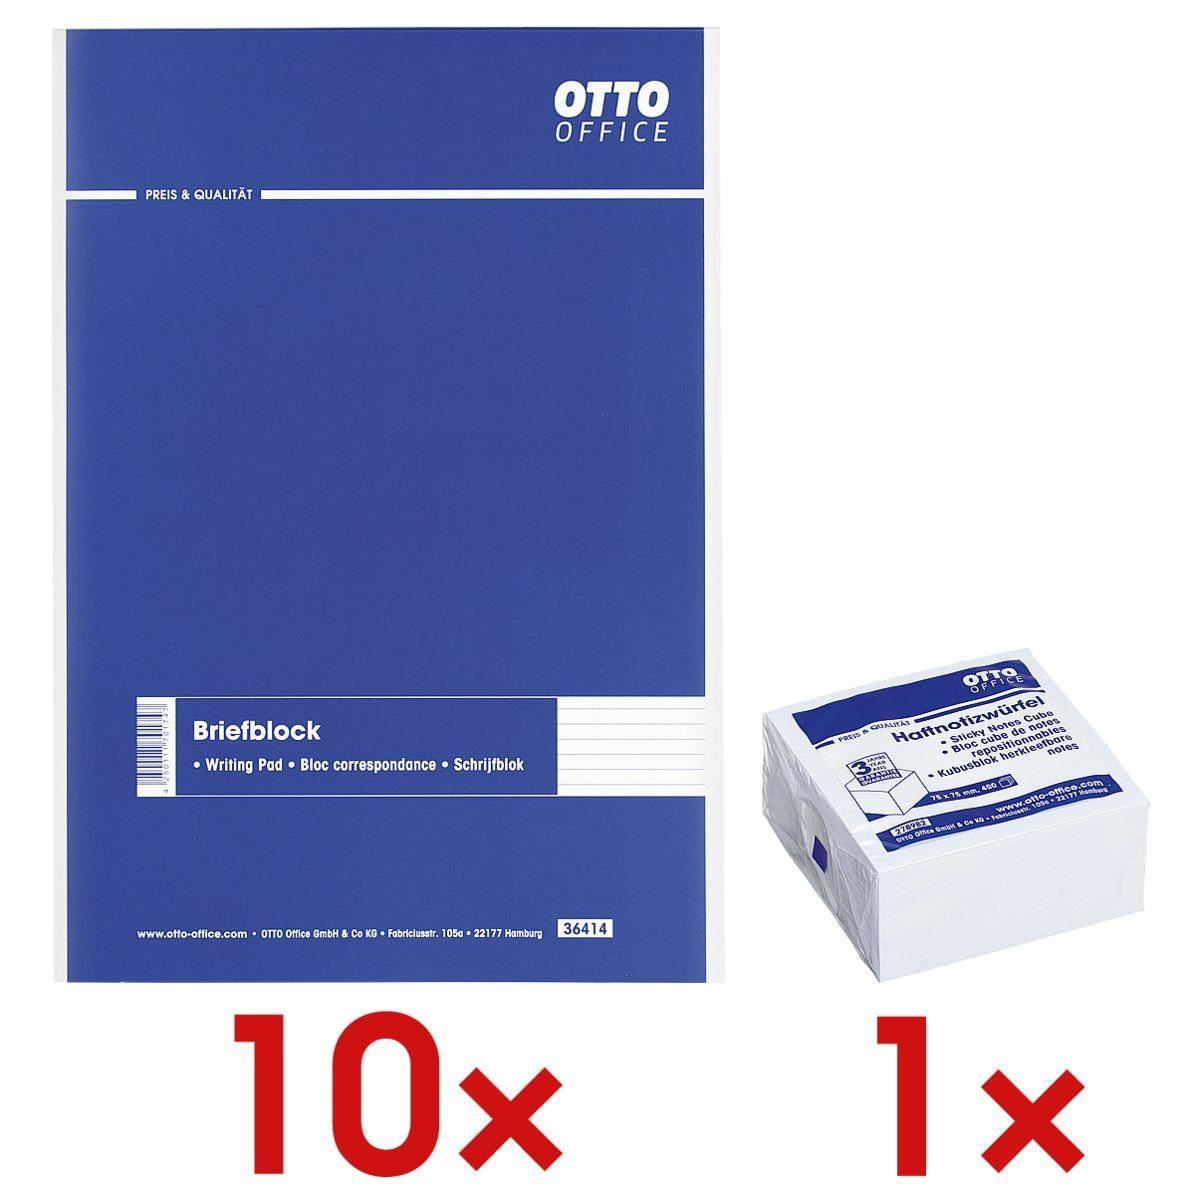 OTTOOFFICE STANDARD 10 Briefblöcke inkl. 1 Haftnotizwürfel 1 Set